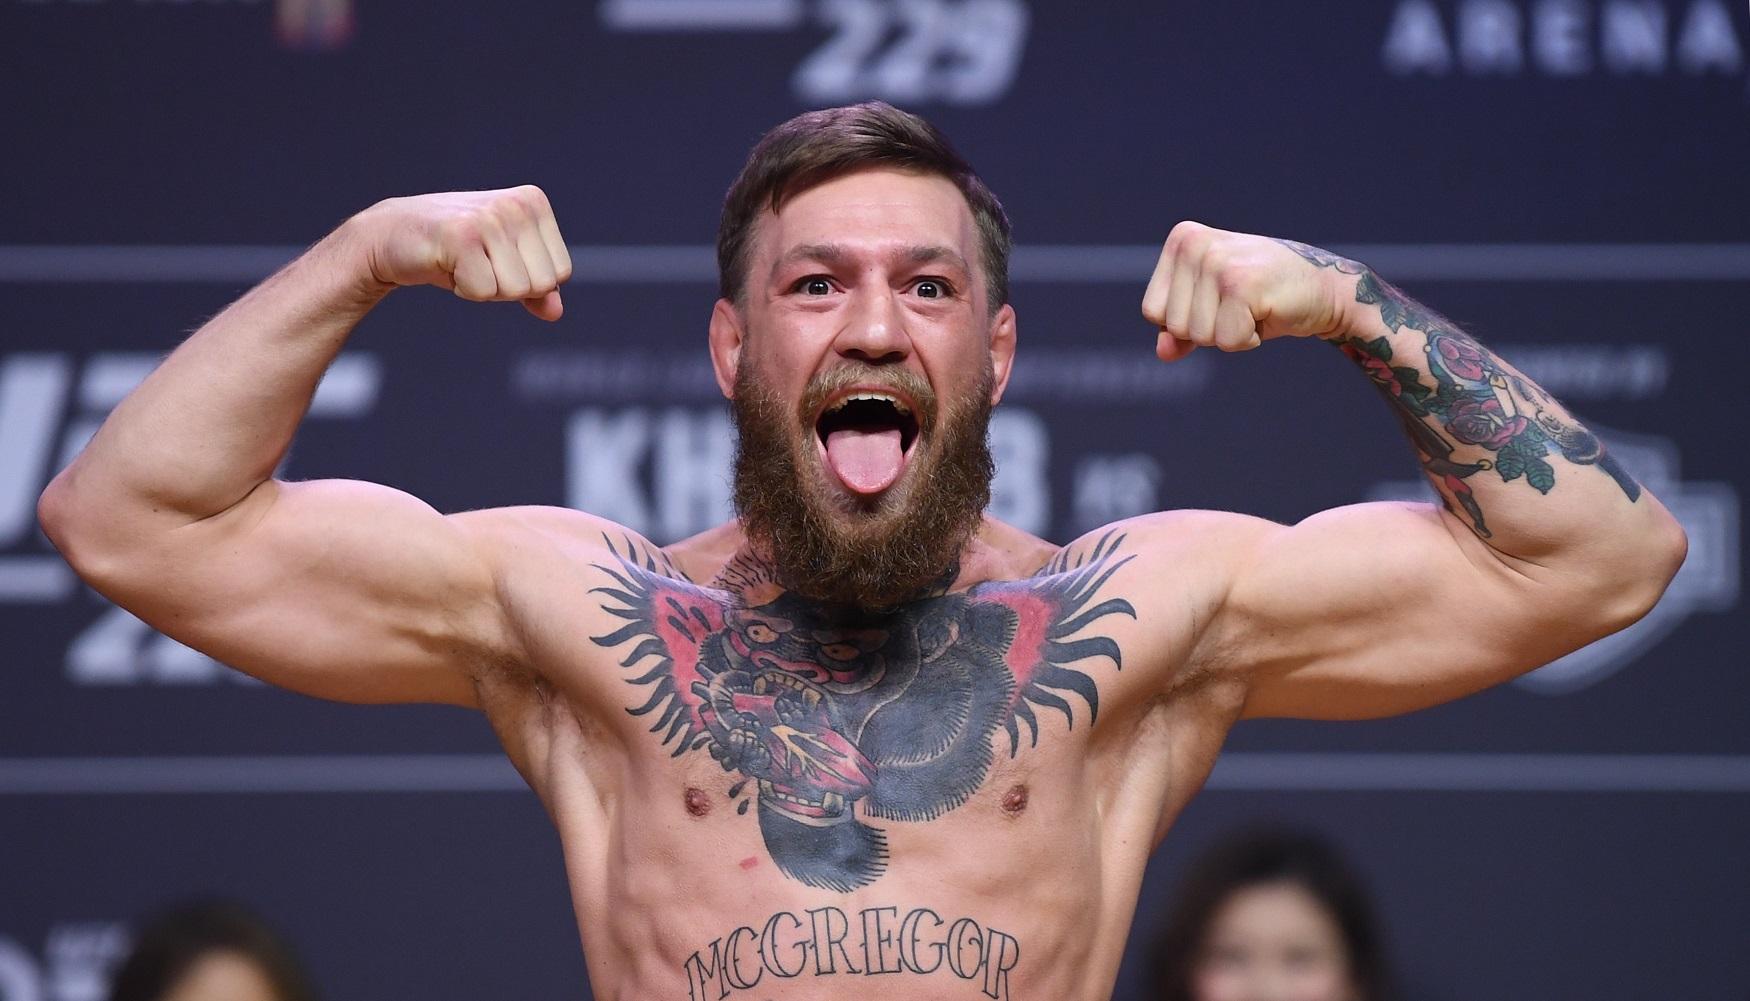 Conor McGregor's 4-Word Tweet Makes a Gutsy Guarantee About UFC 257